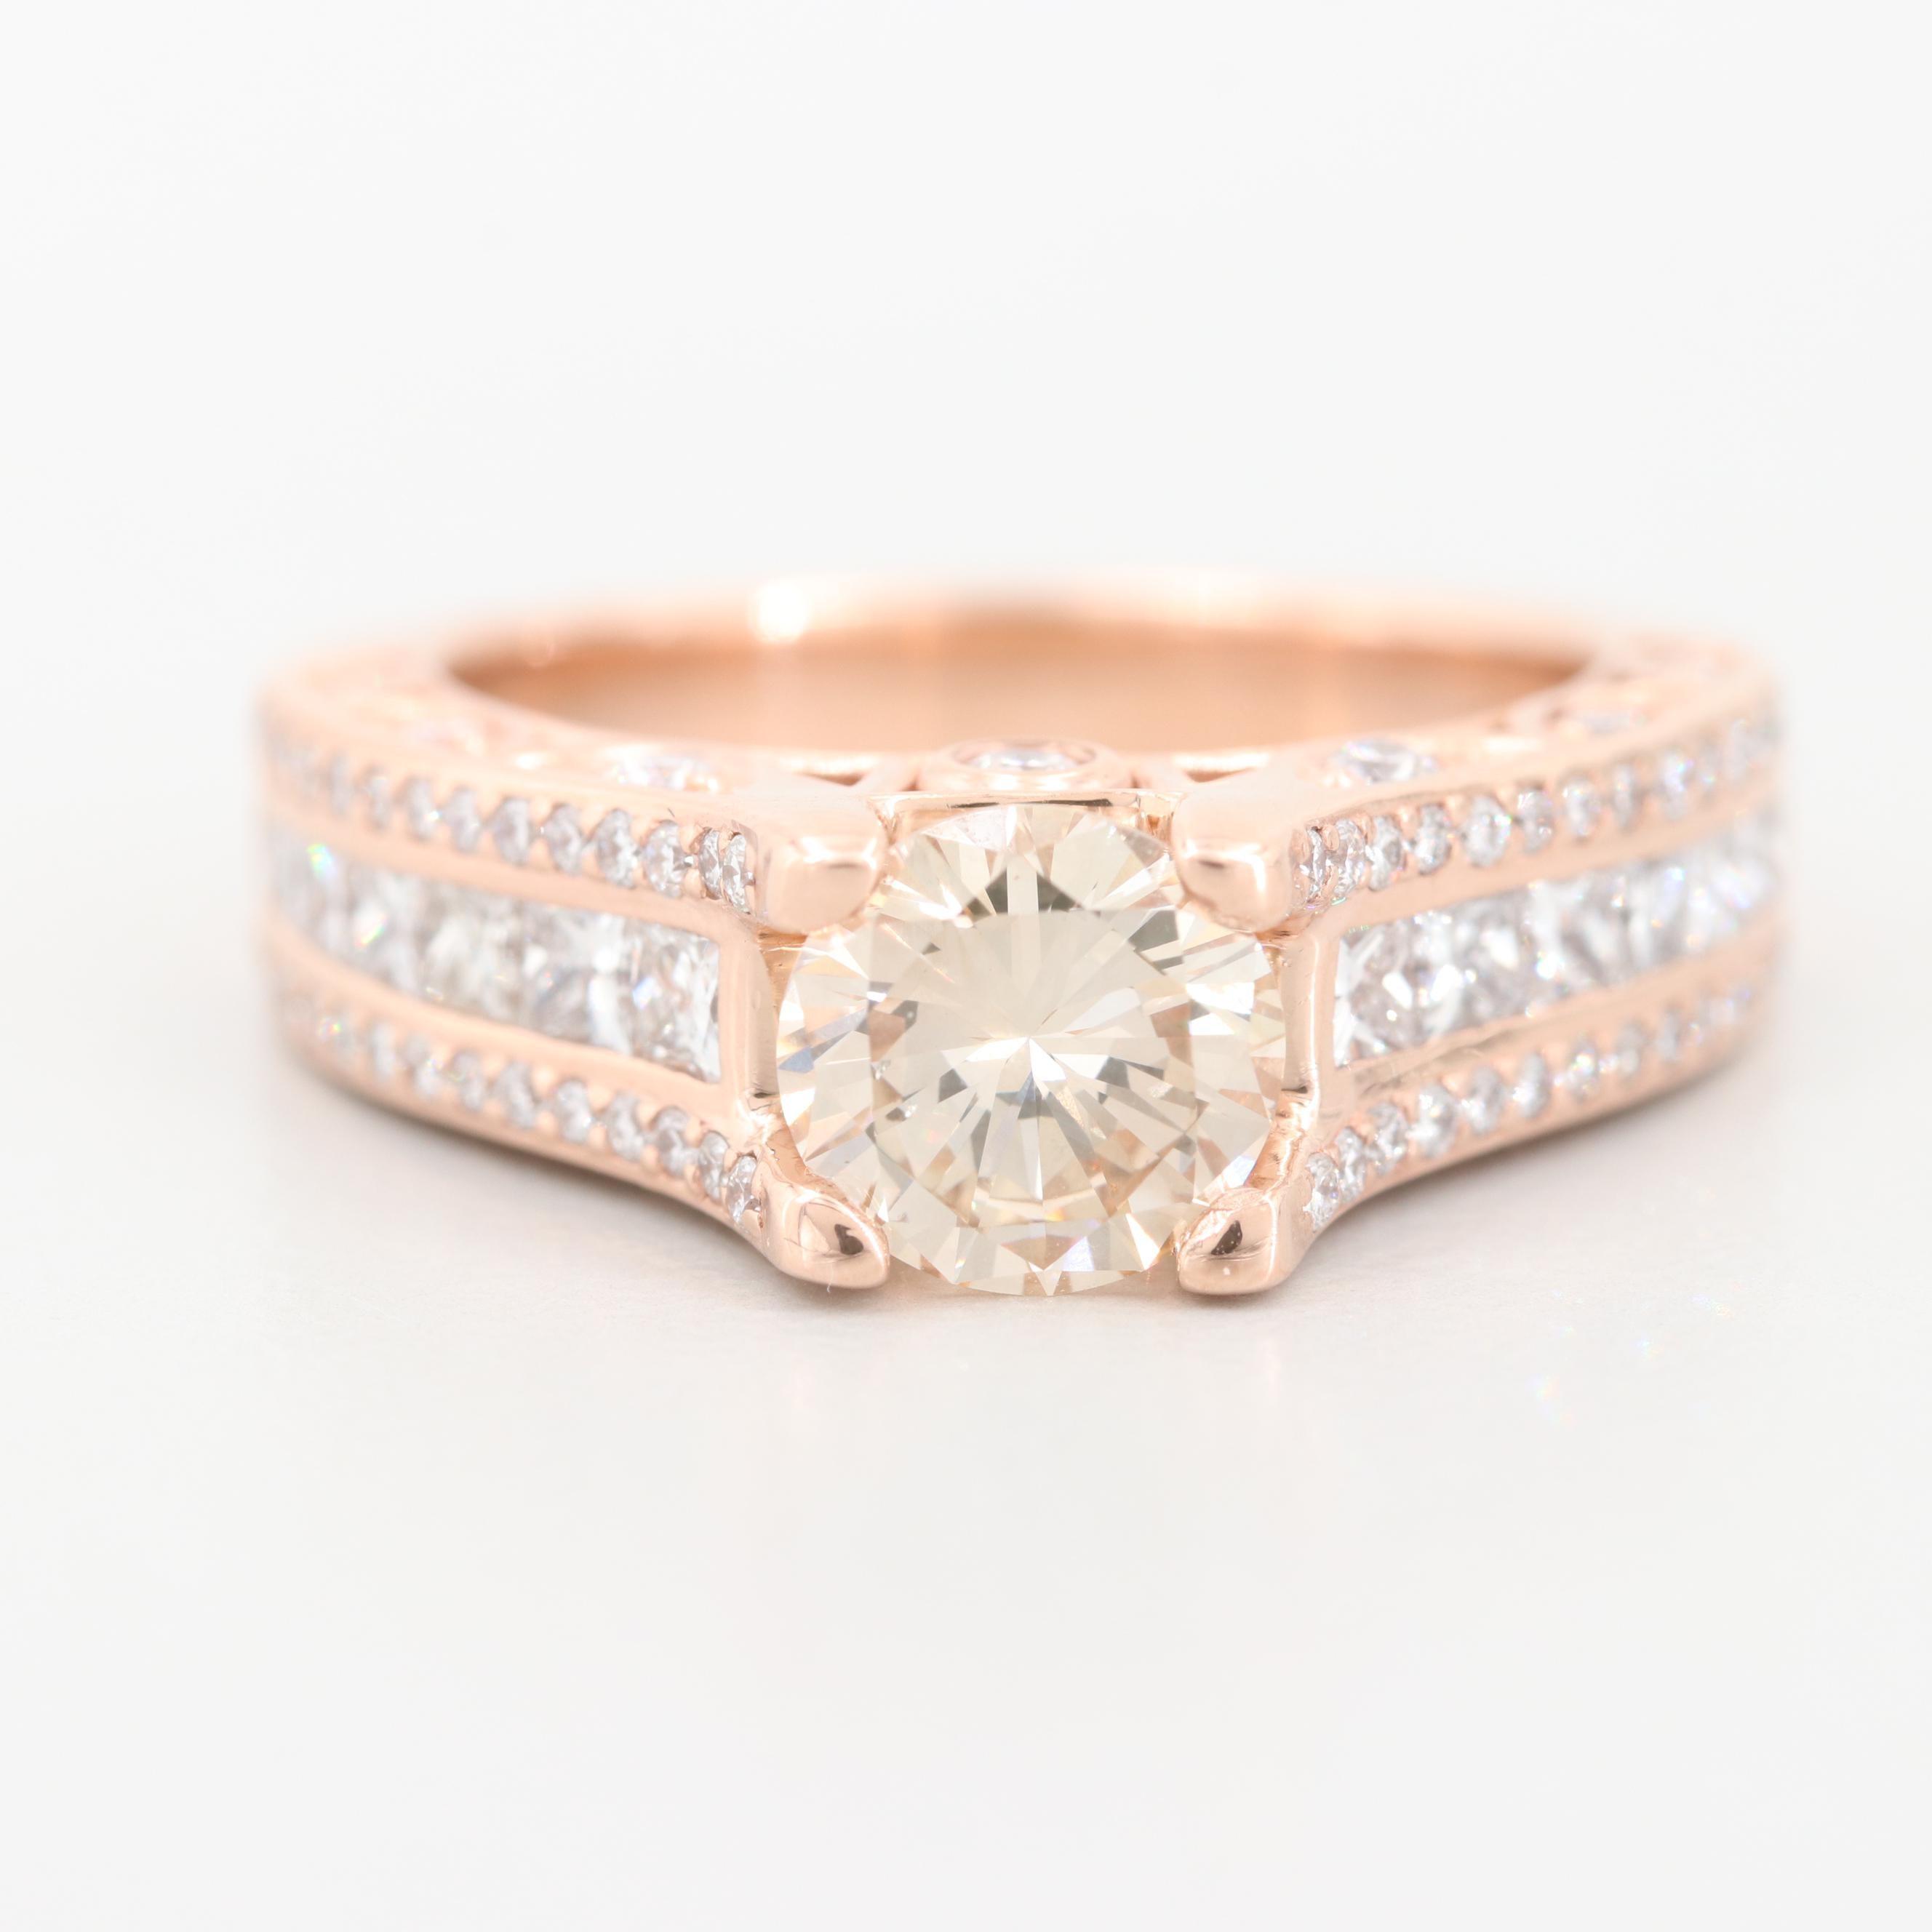 14K Rose Gold 2.78 CTW Diamond Ring